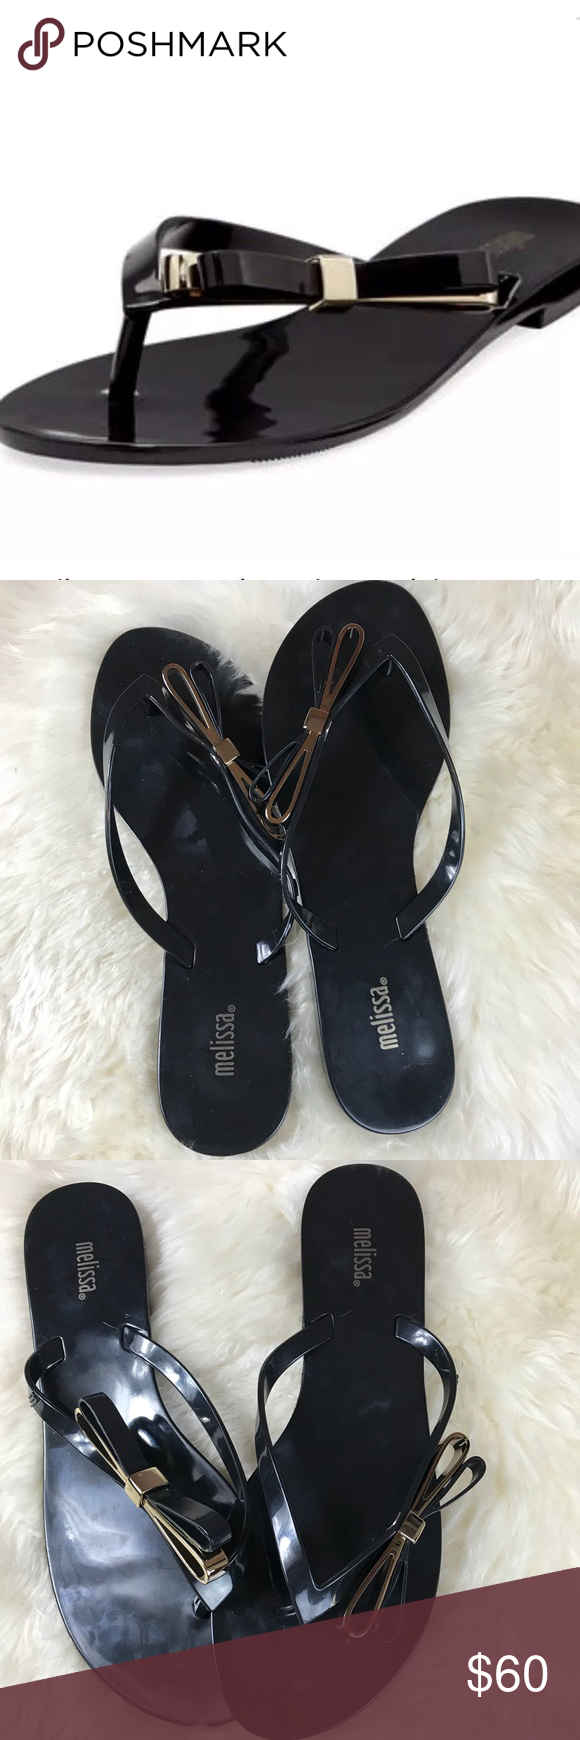 66fab7bf02b NWT Melissa Harmonic Make A Wish Bow Sandals 9 Melissa Sandals Size  9  Color  Black